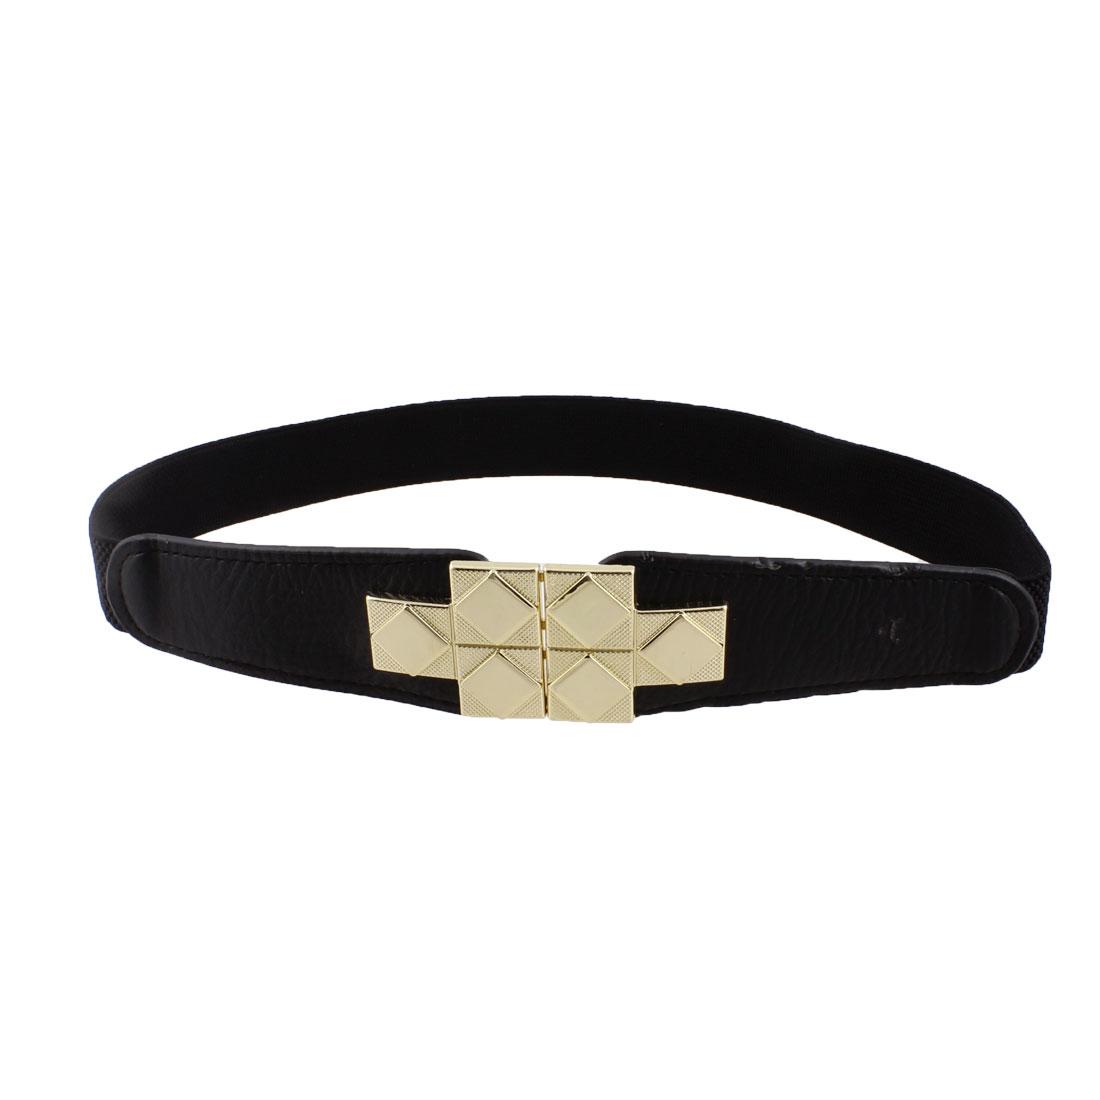 Lady T Shaped Interlocking Buckle Stretchy Waist Belt Waistband Corset Band Black